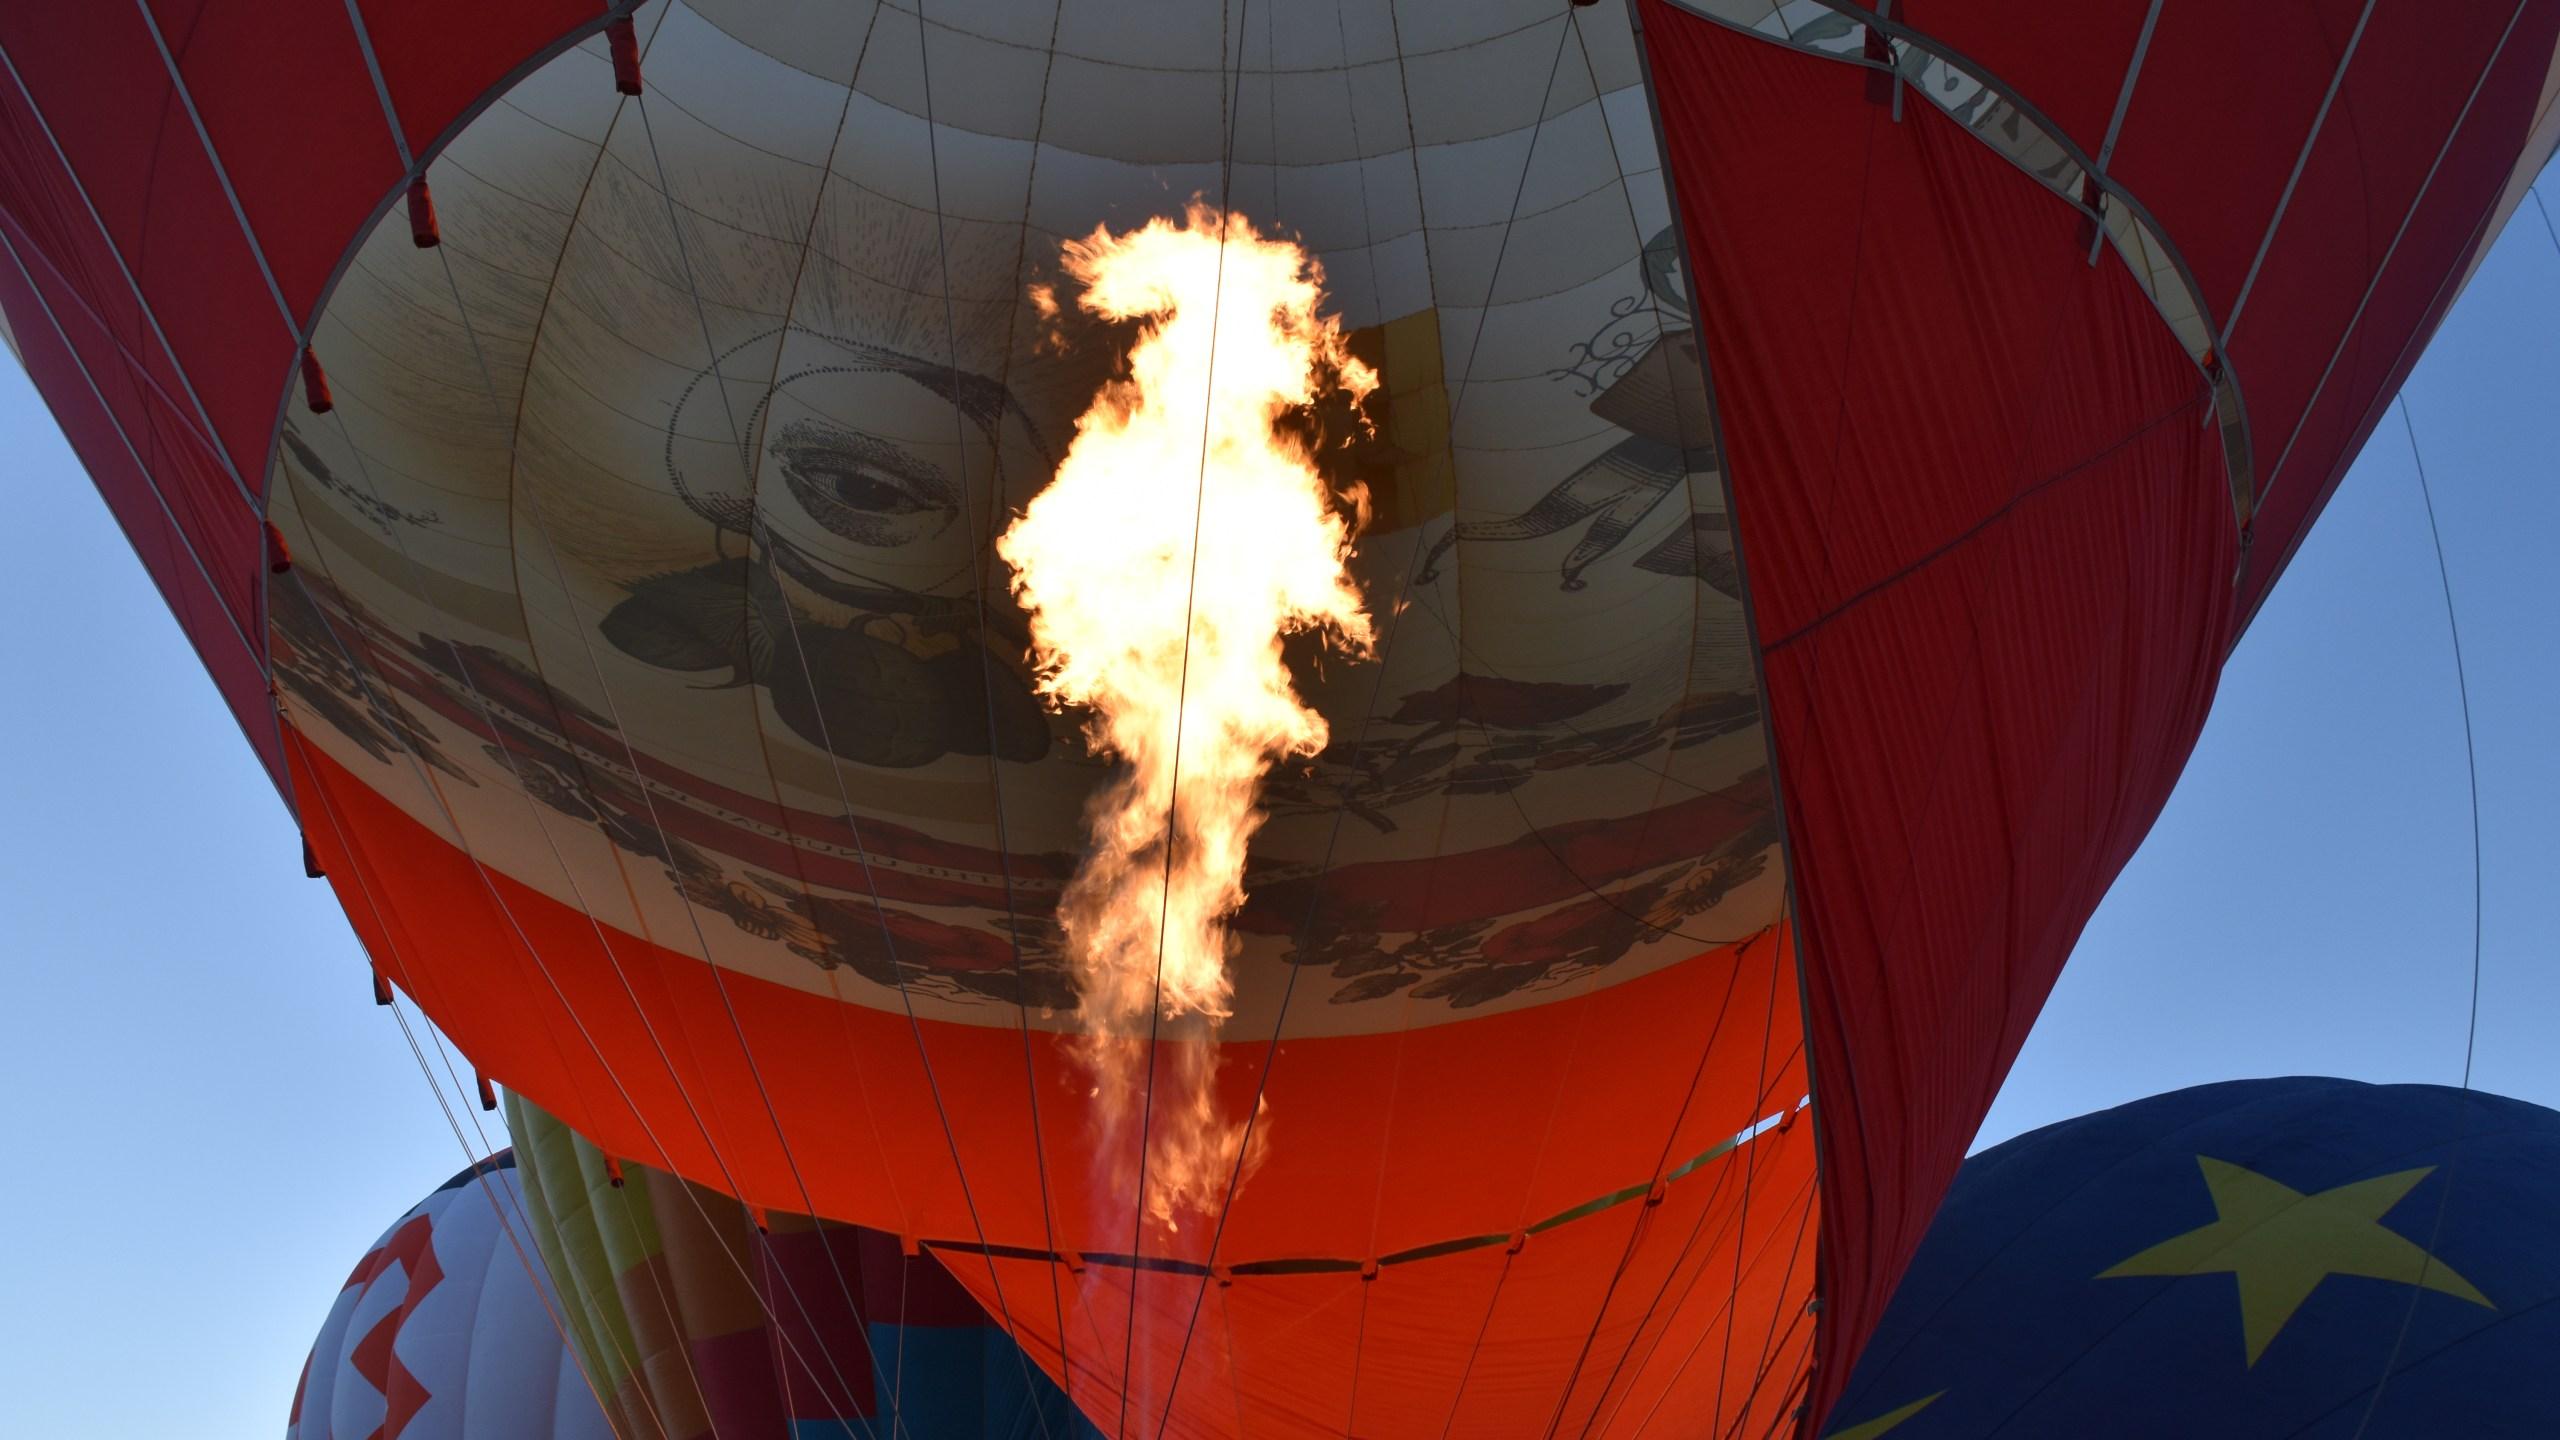 Balloon Fiesta 9_1535750153404.JPG.jpg